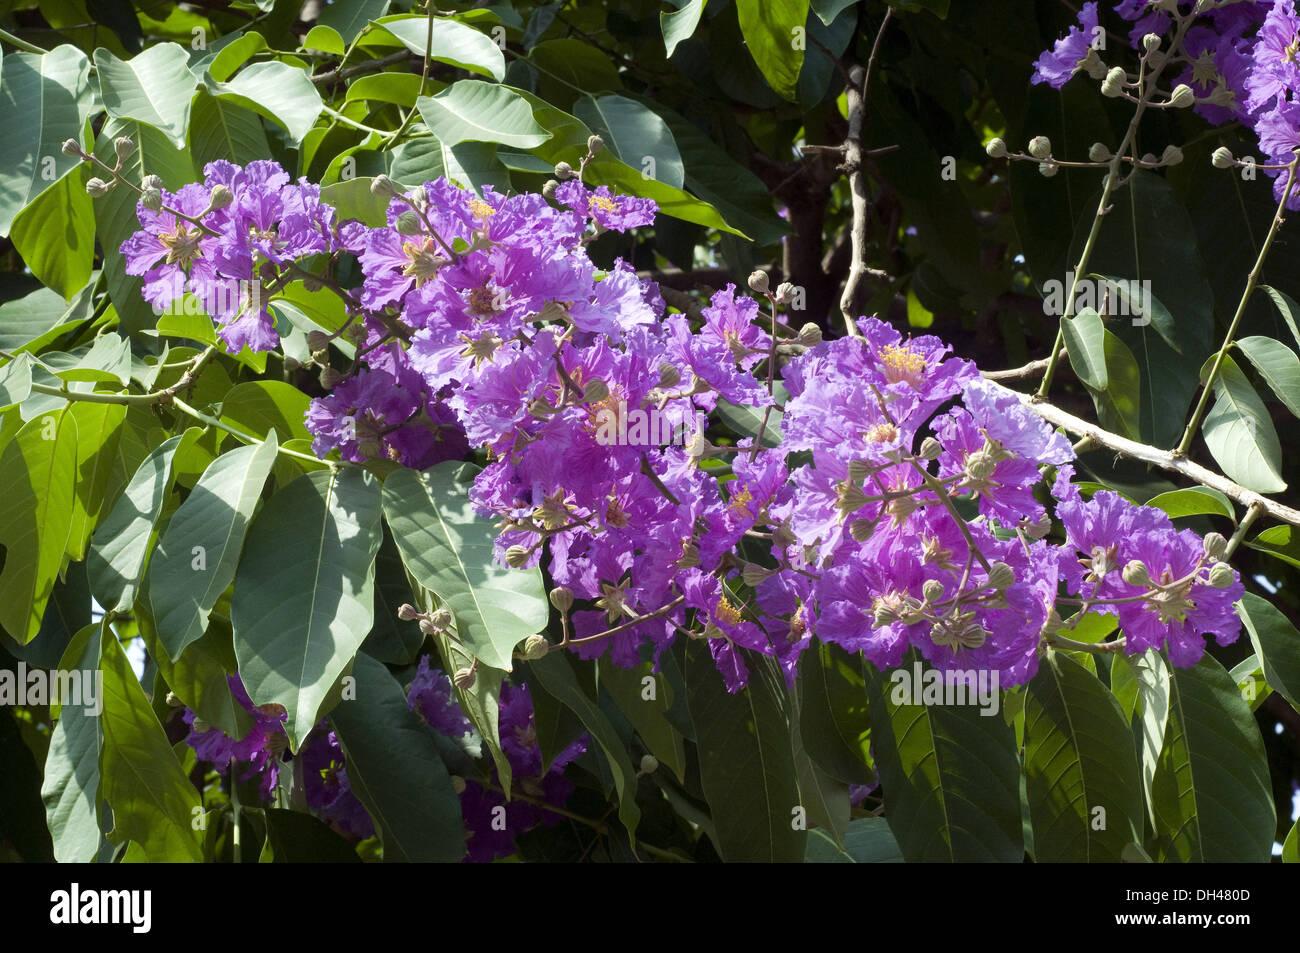 exotic rare purple violet Queen flower - Stock Image